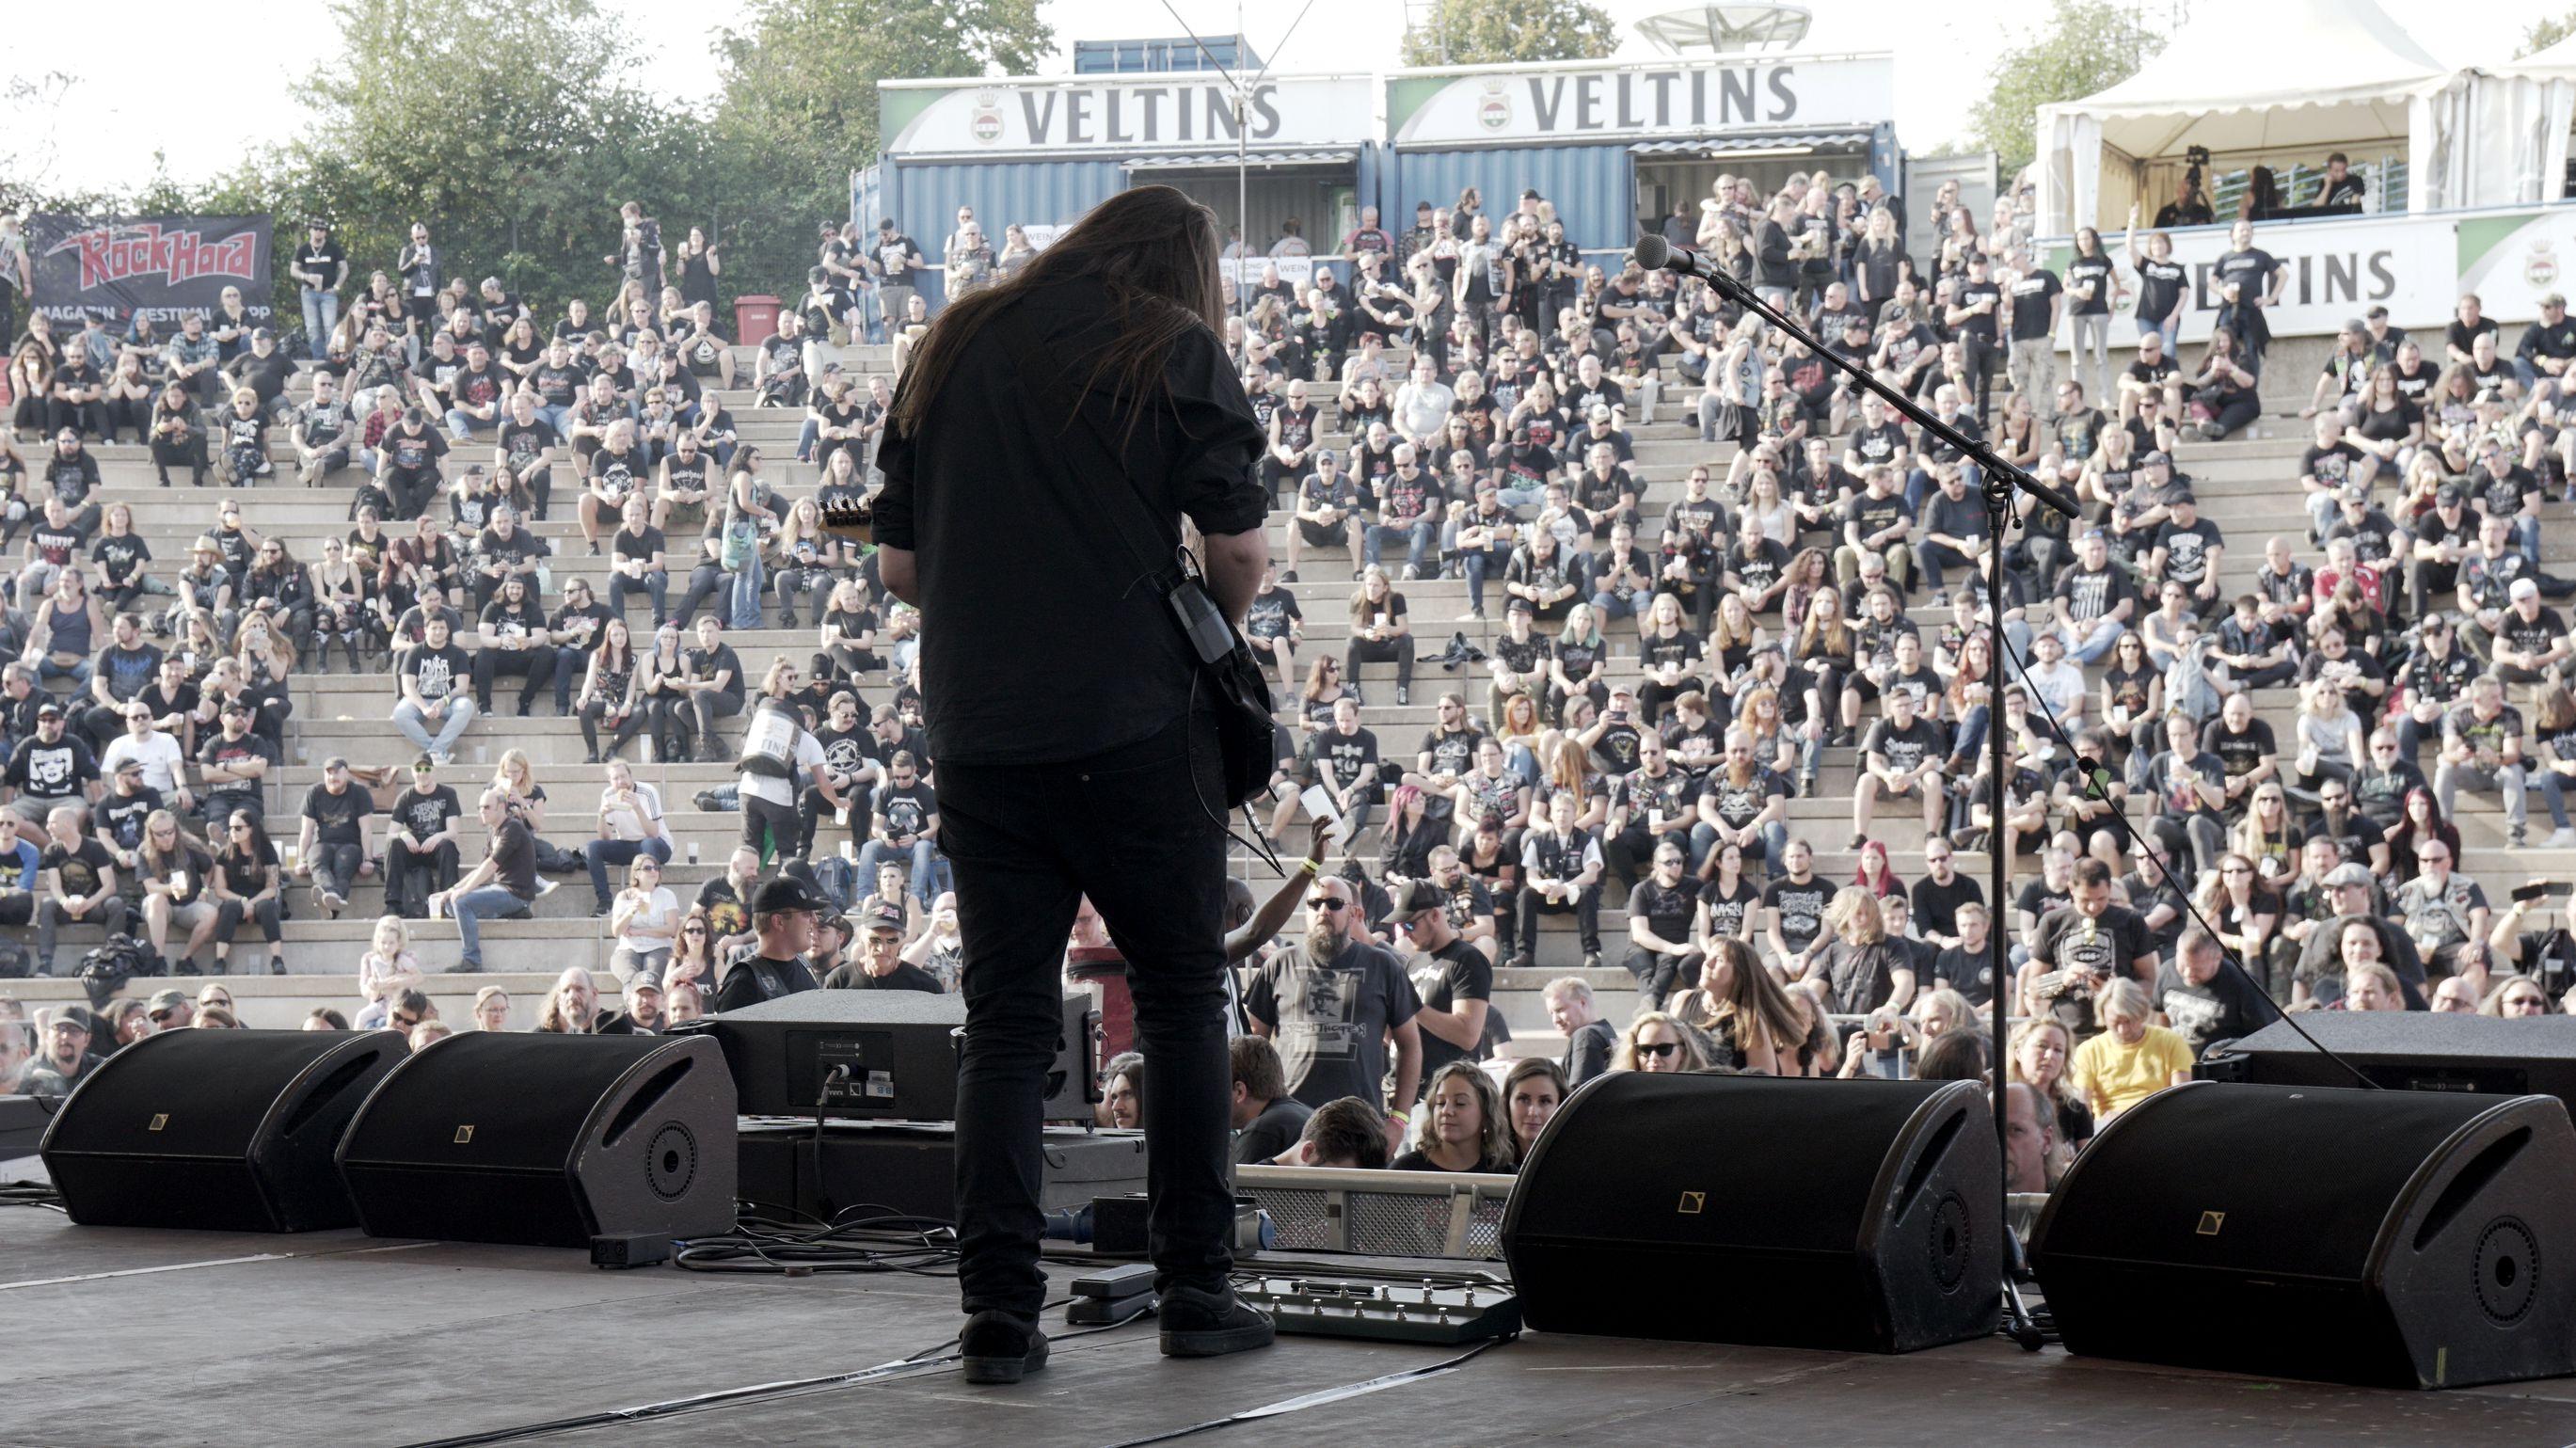 Rock-Hard-Festival-2021-One-Day-The-Very-End-Asphyx-Rage-Motorjesus-Wolfskull-Darkness-Scorched-Oak-Amphitheater-Gelsenkirchen_4